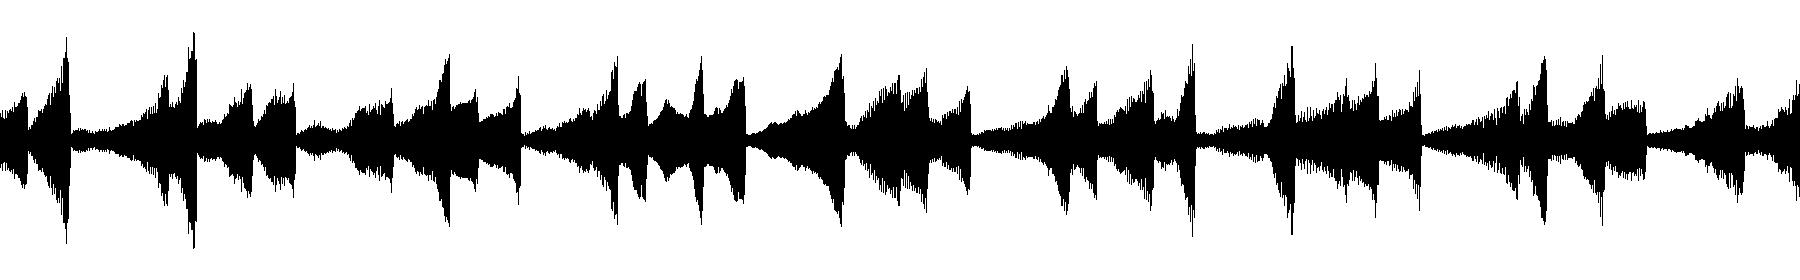 thejuice reverse piano   104bpm  am